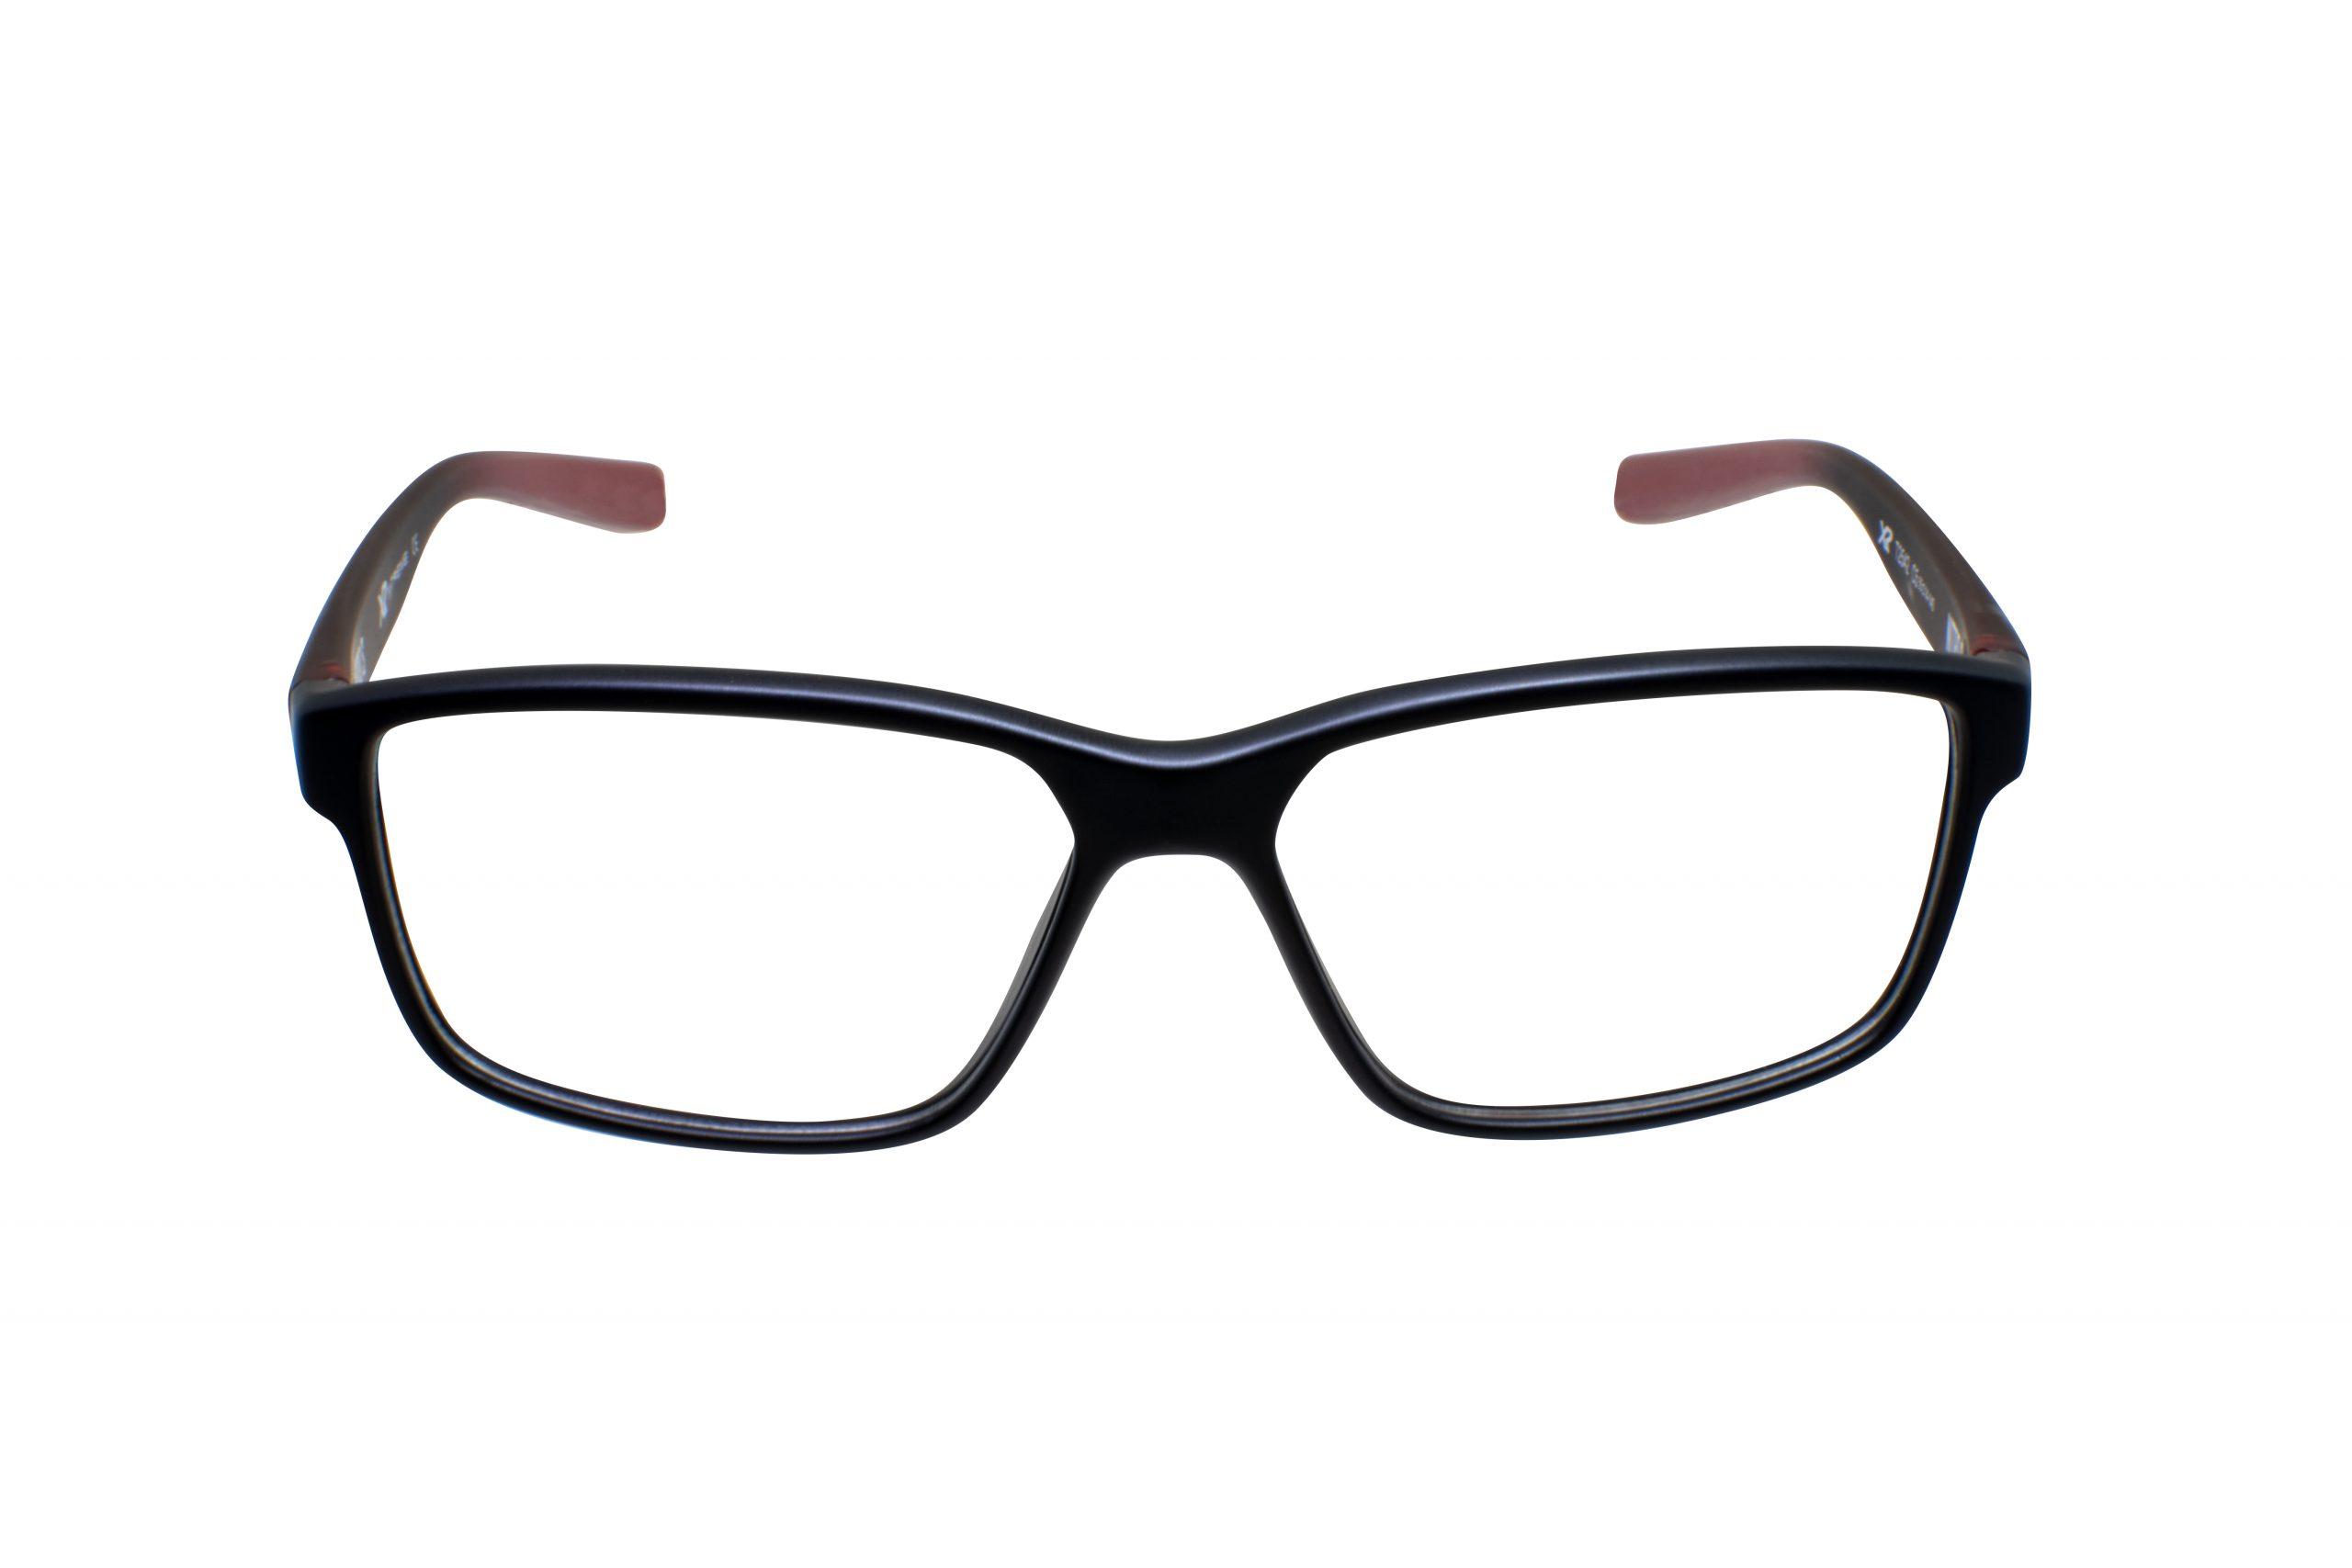 xtreme-nitro-s-preto-vermelho-2